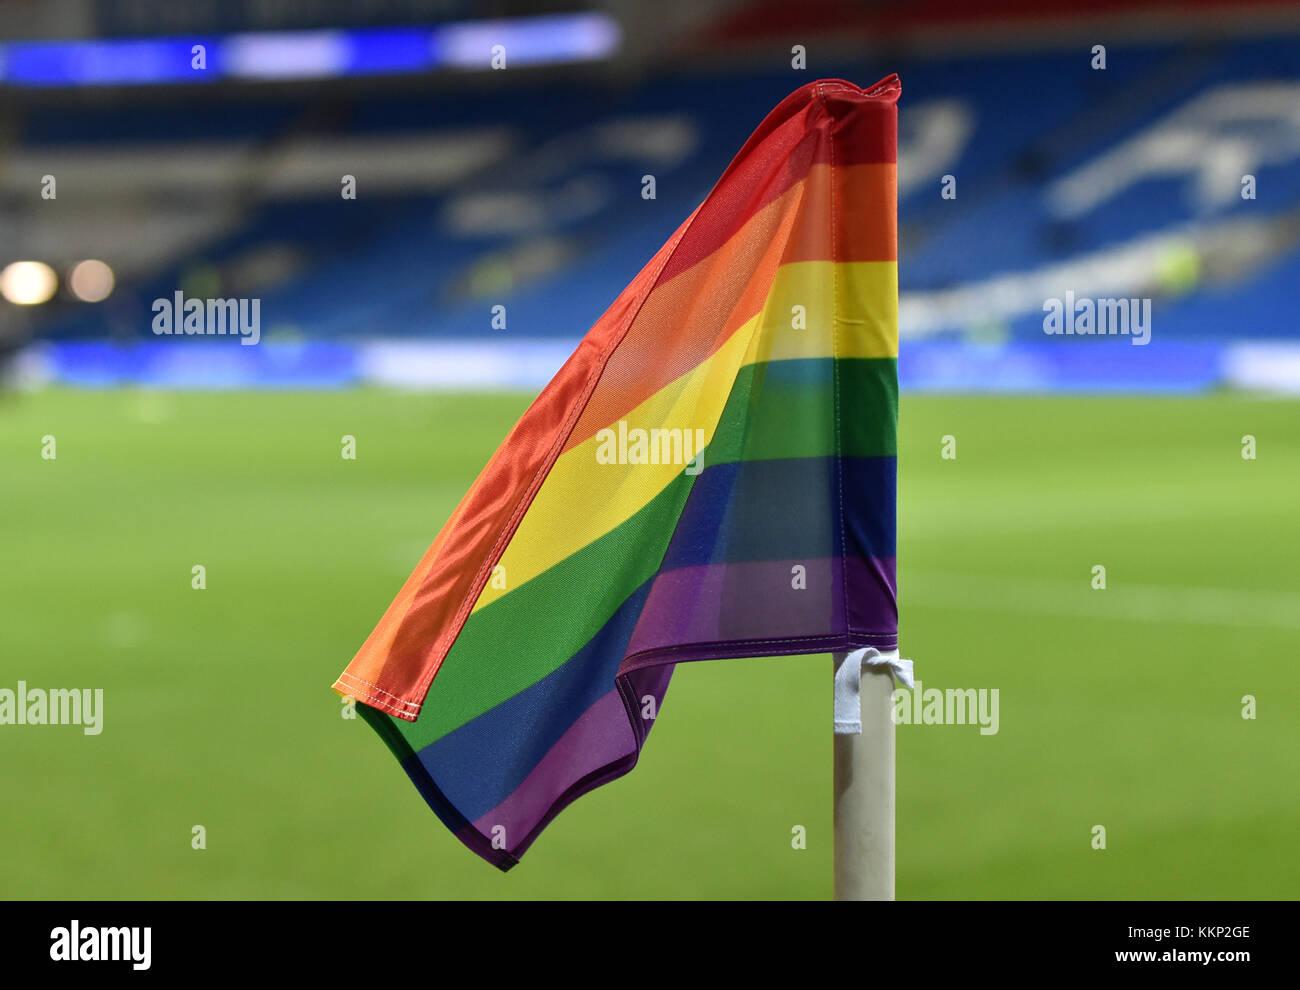 A rain bow corner flag at the Sky Bet Championship match at the Cardiff City Stadium, Cardiff. PRESS ASSOCIATION - Stock Image